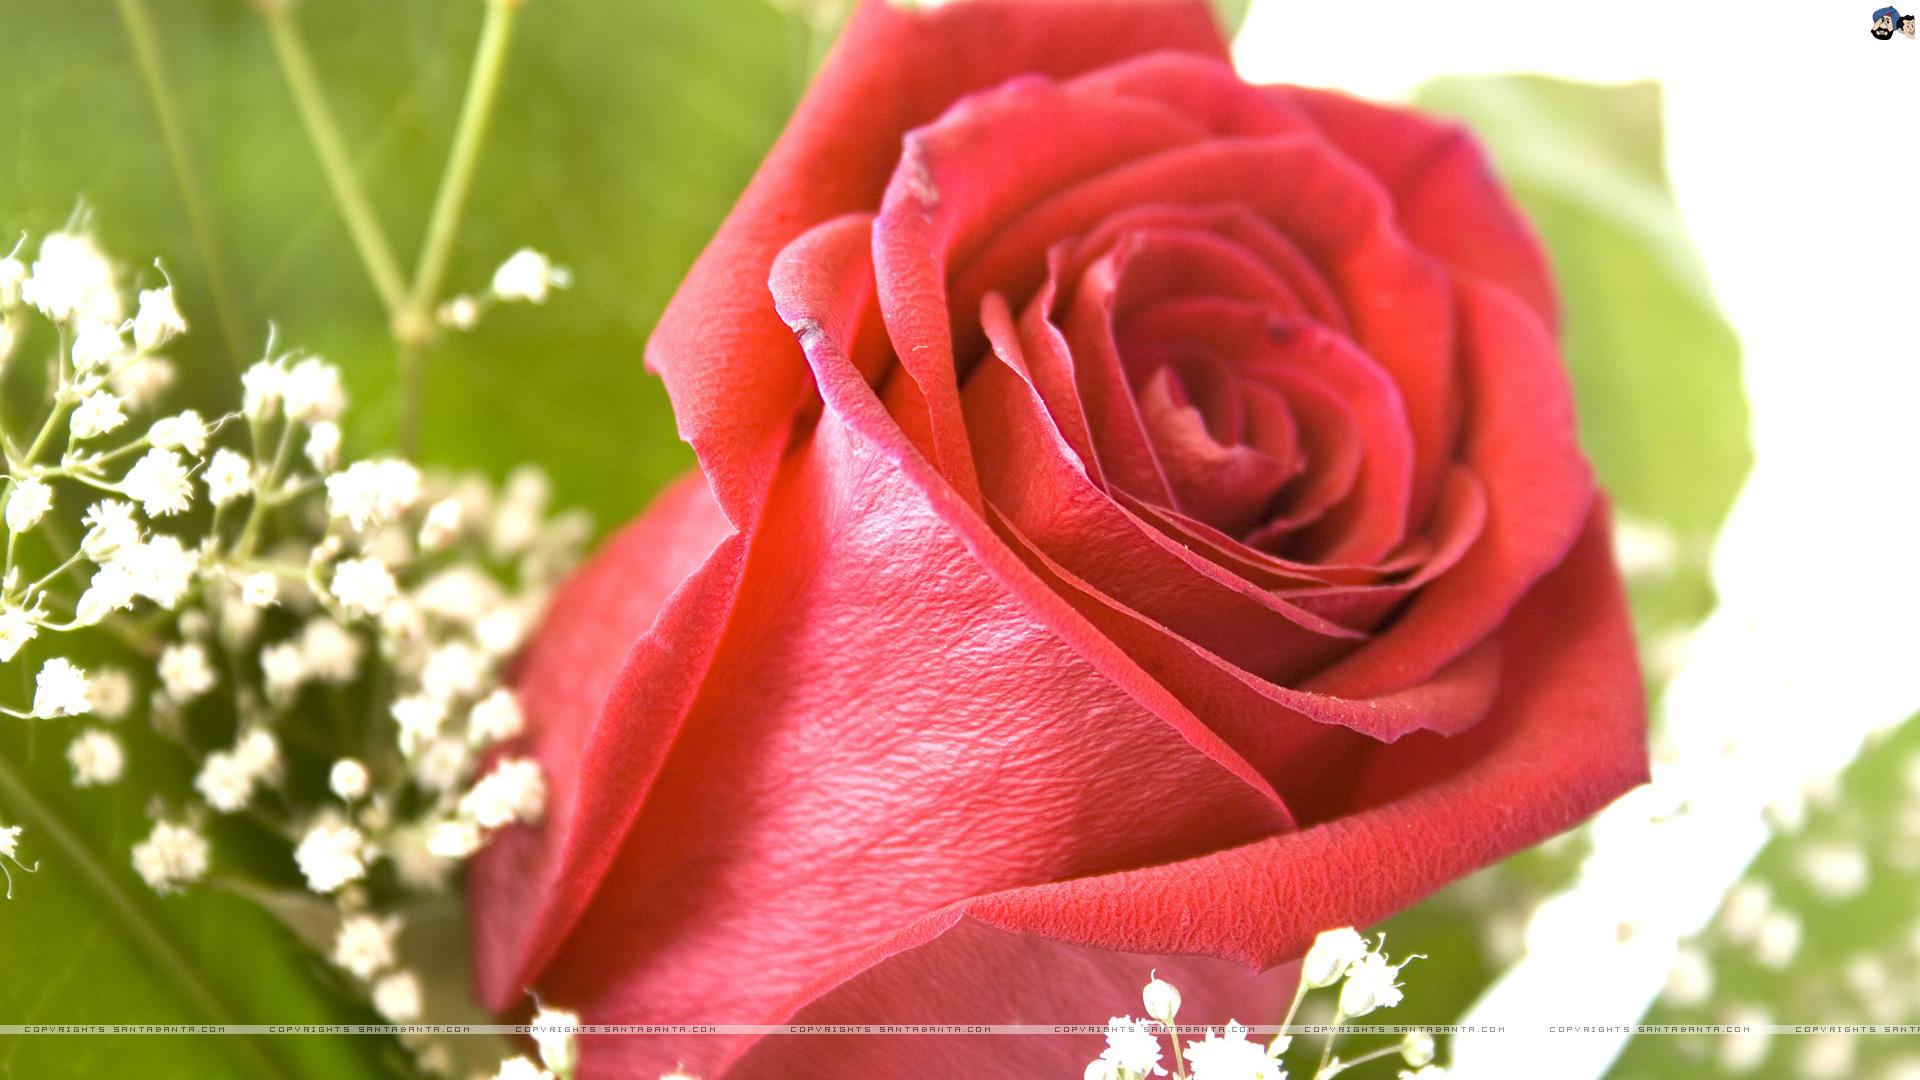 Beautiful flowers wallpapers roses animaxwallpaper wallpaper flowers rose beautiful flower 2017 izmirmasajfo